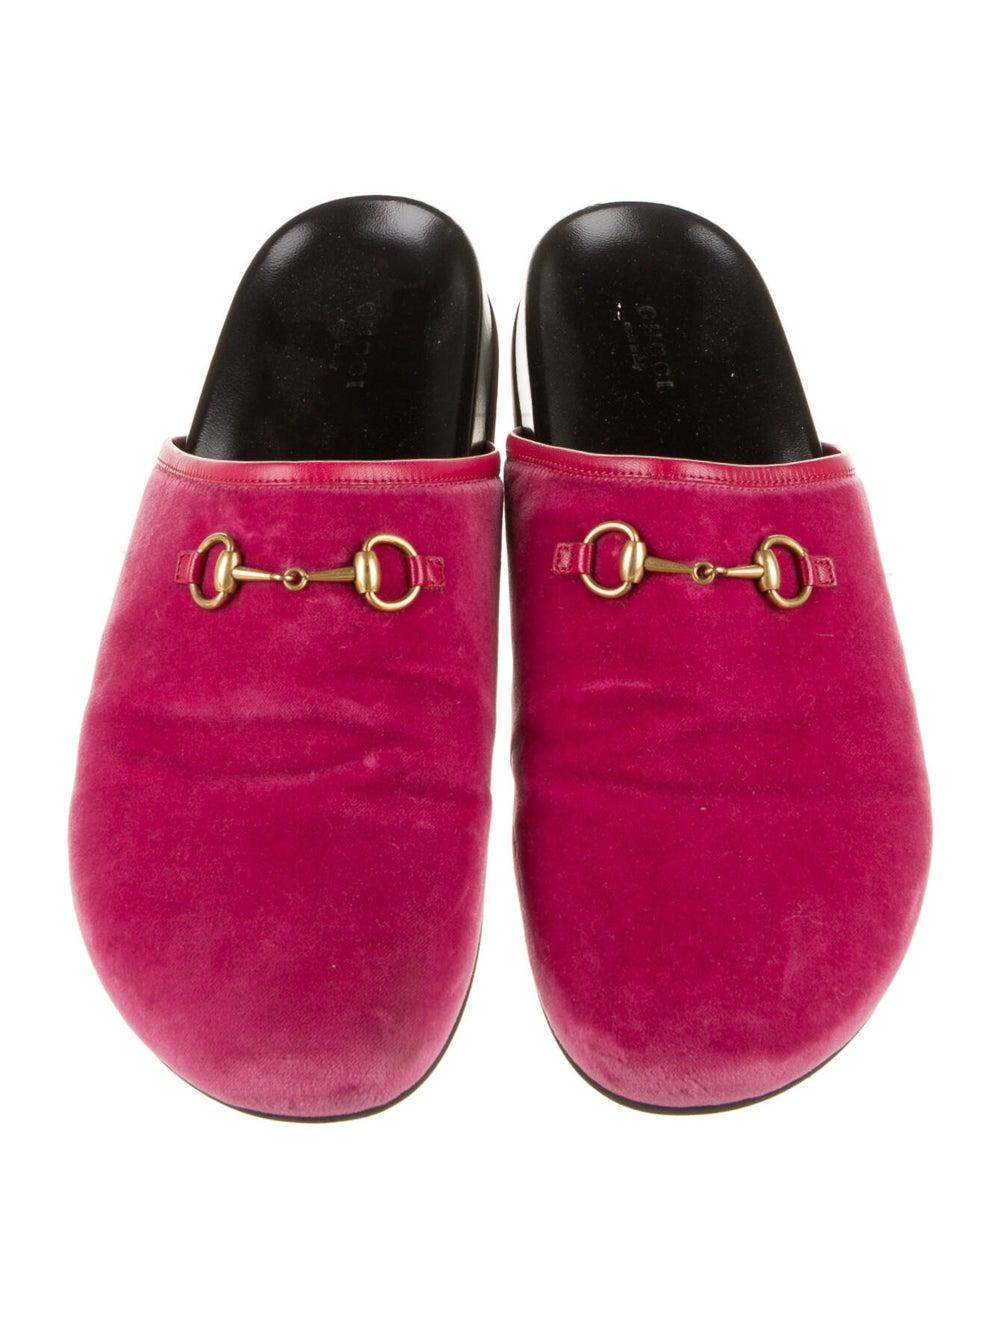 Gucci Horsebit Accent Mules Pink - image 3